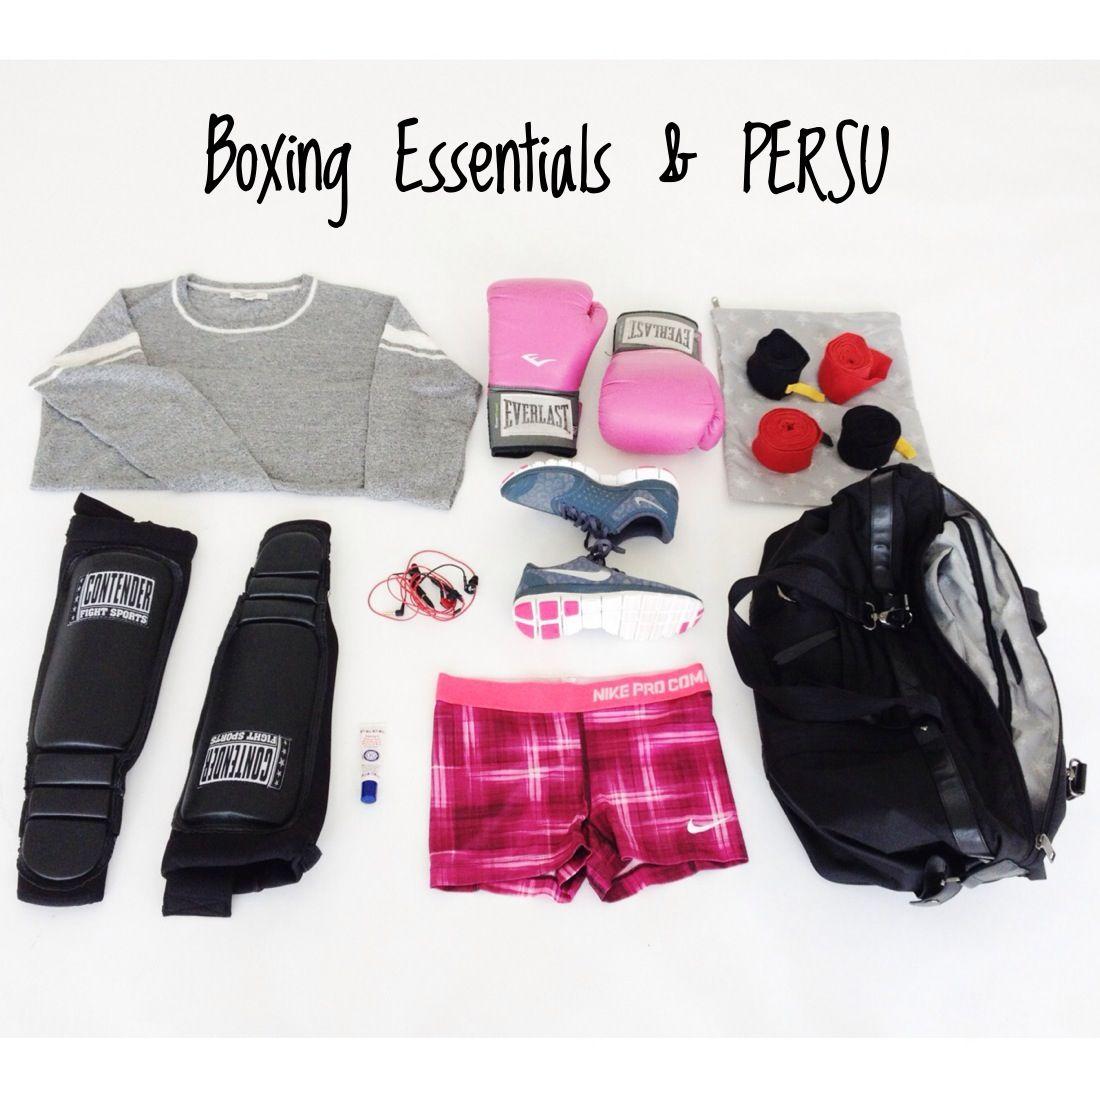 Persu Athletic Bag Fits All Your Kickboxing Essentials Gym Bag Essentials Kickboxing Bag Girls Gym Bag